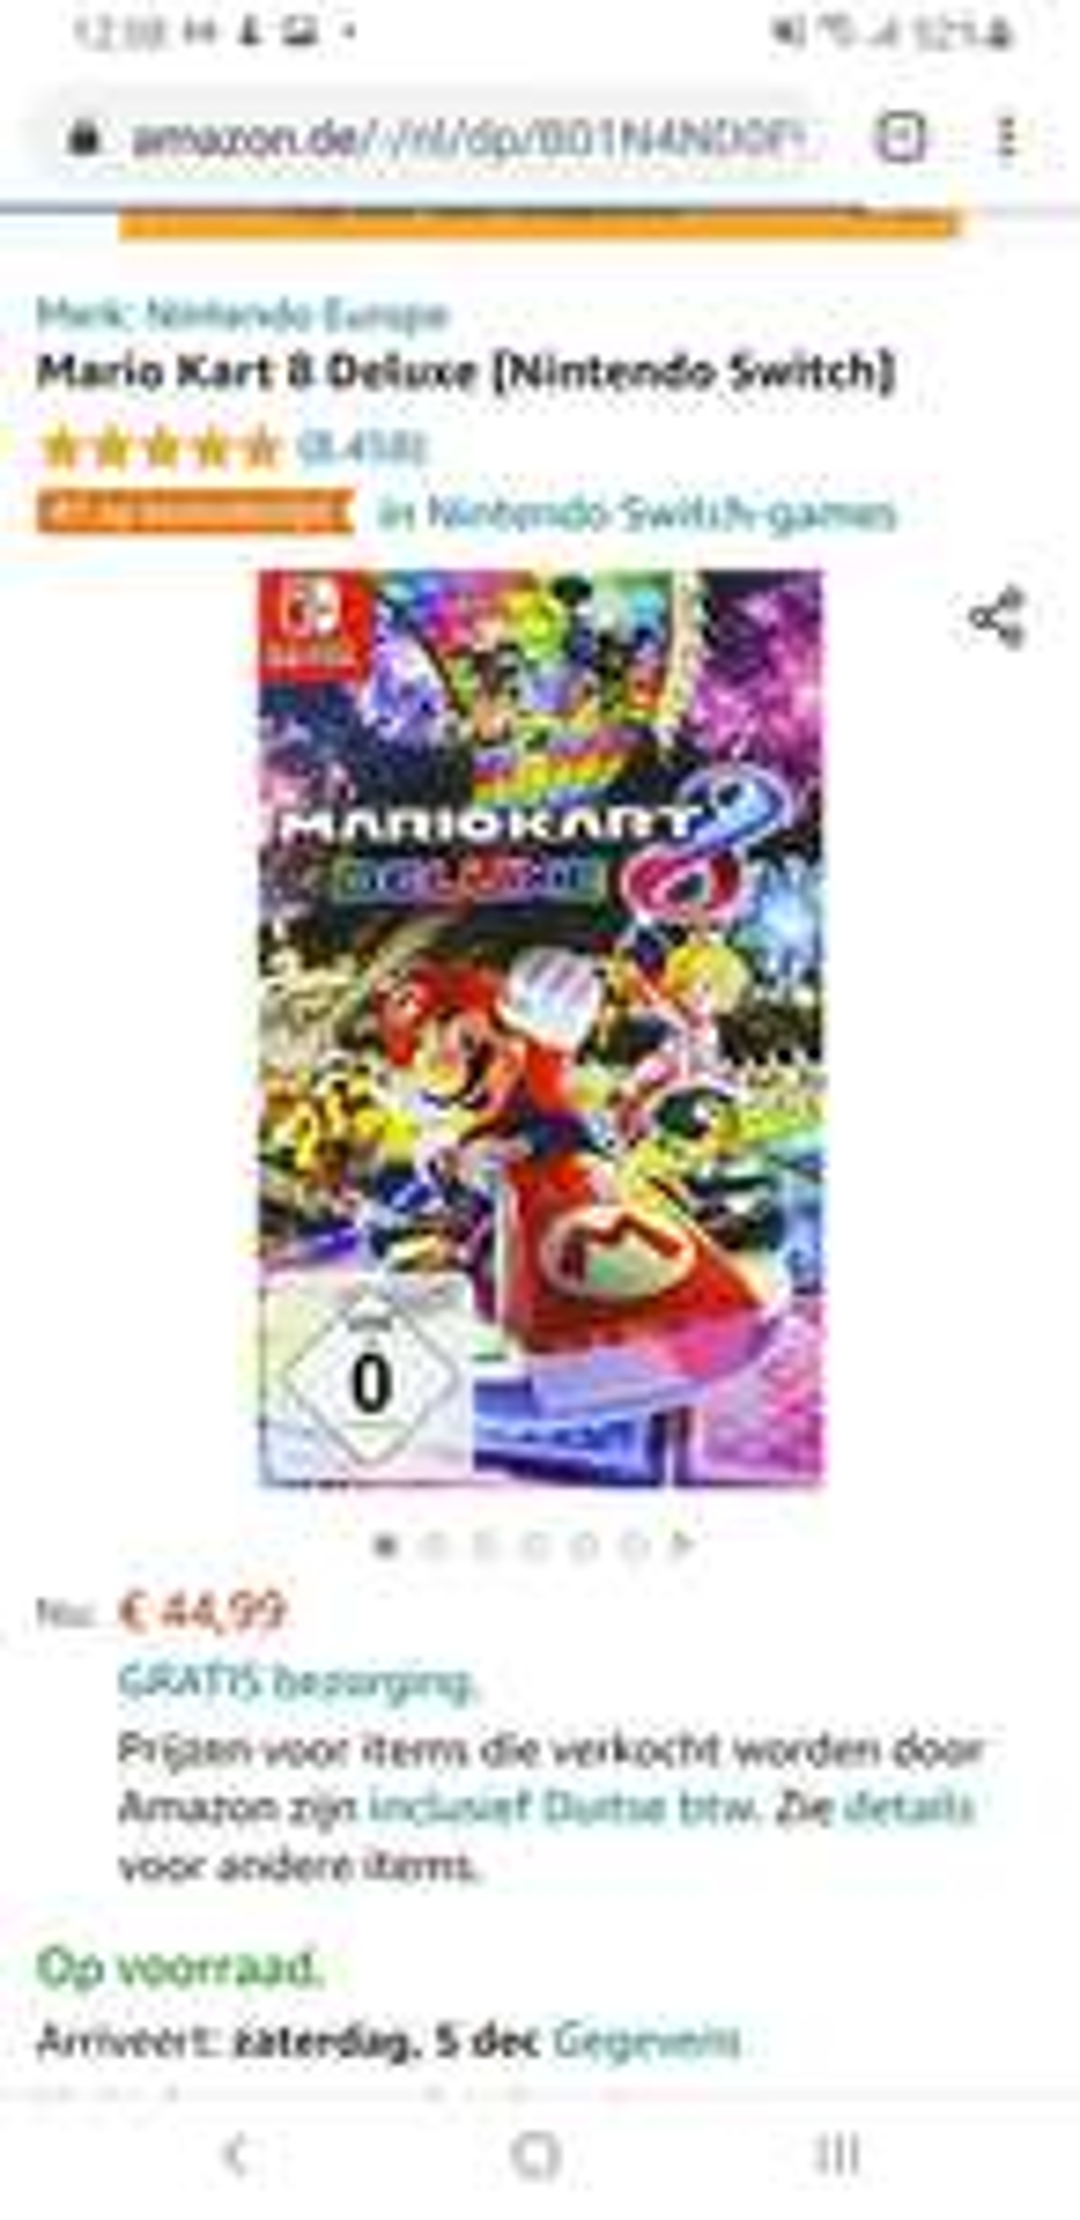 Nintendo switch Mario kart 8 deluxe amazon.de en amazon.nl